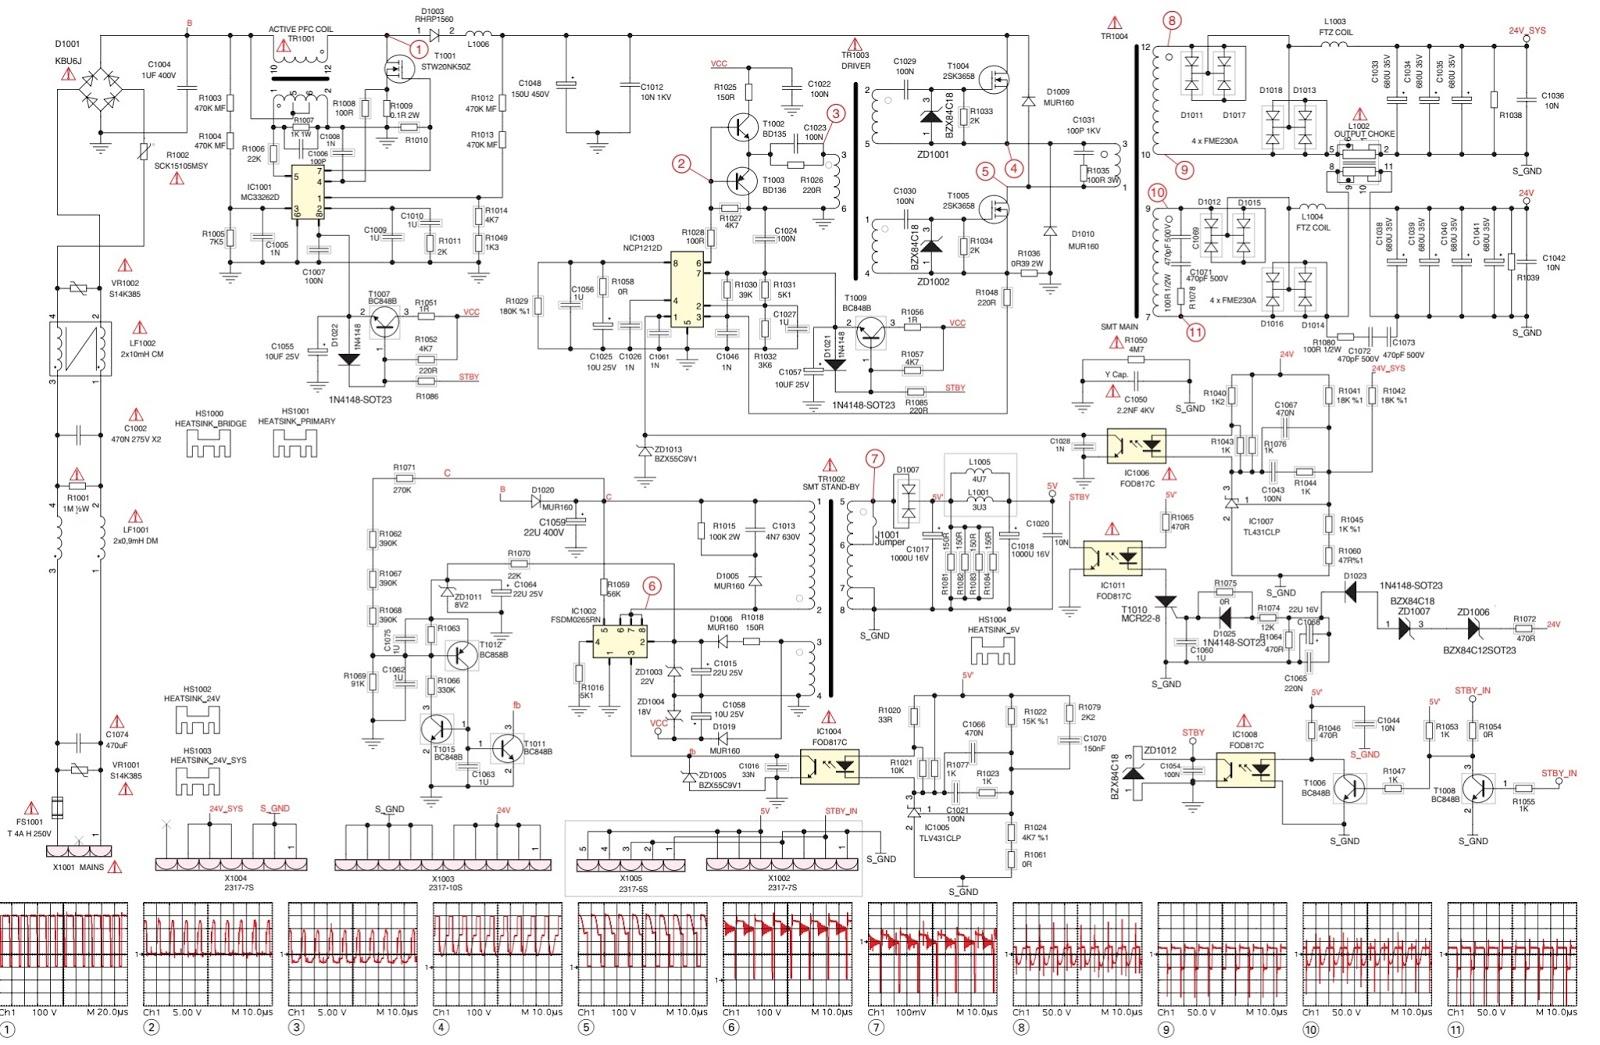 power supply board zz7194 11 mc33262d ncp1212d fsdm0265rn fod817c opto  [ 1600 x 1045 Pixel ]